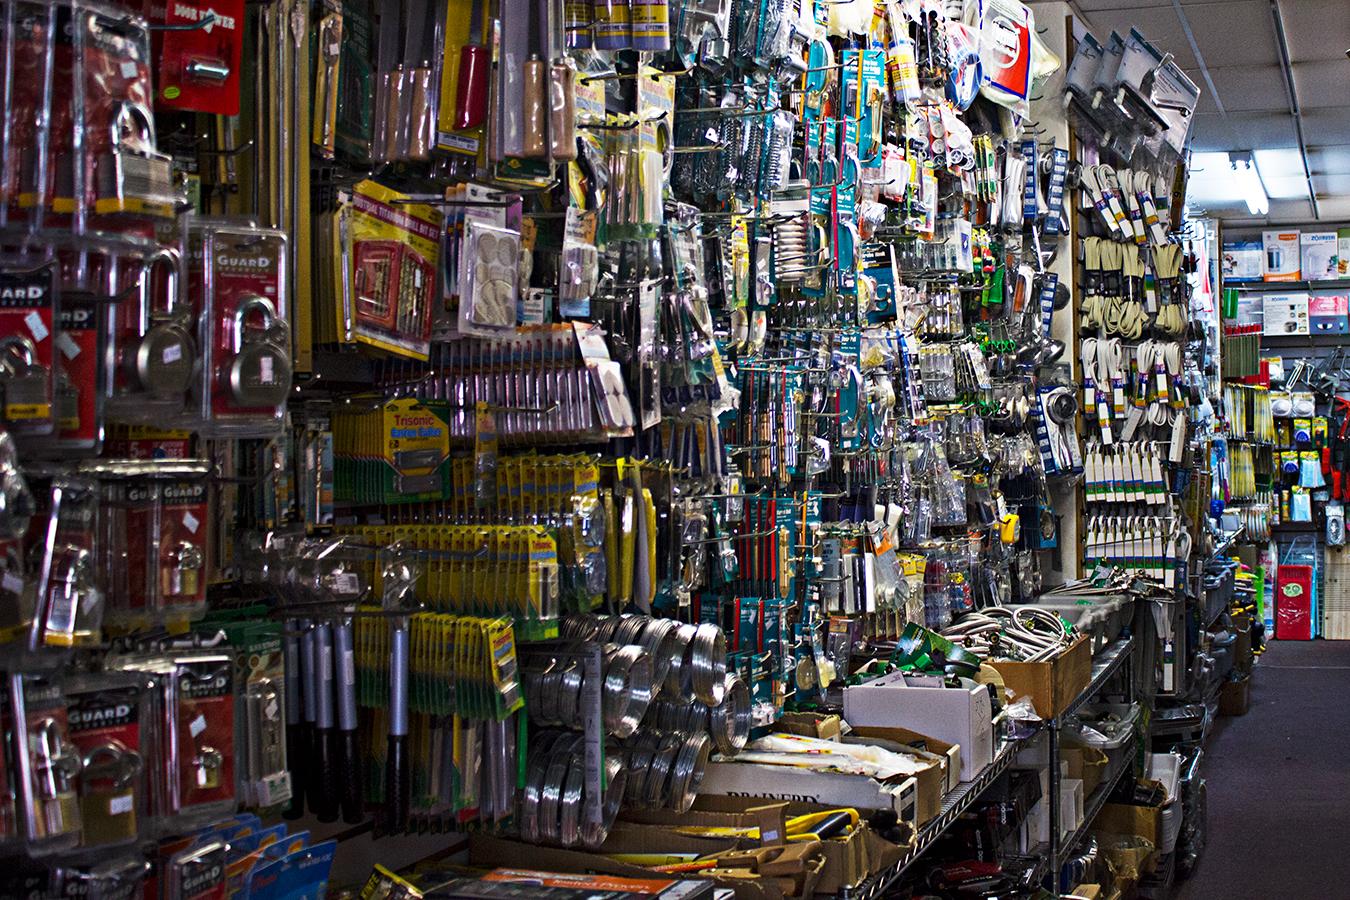 Fangyi_Fan_Hardware_Tools_Chinatown_Store